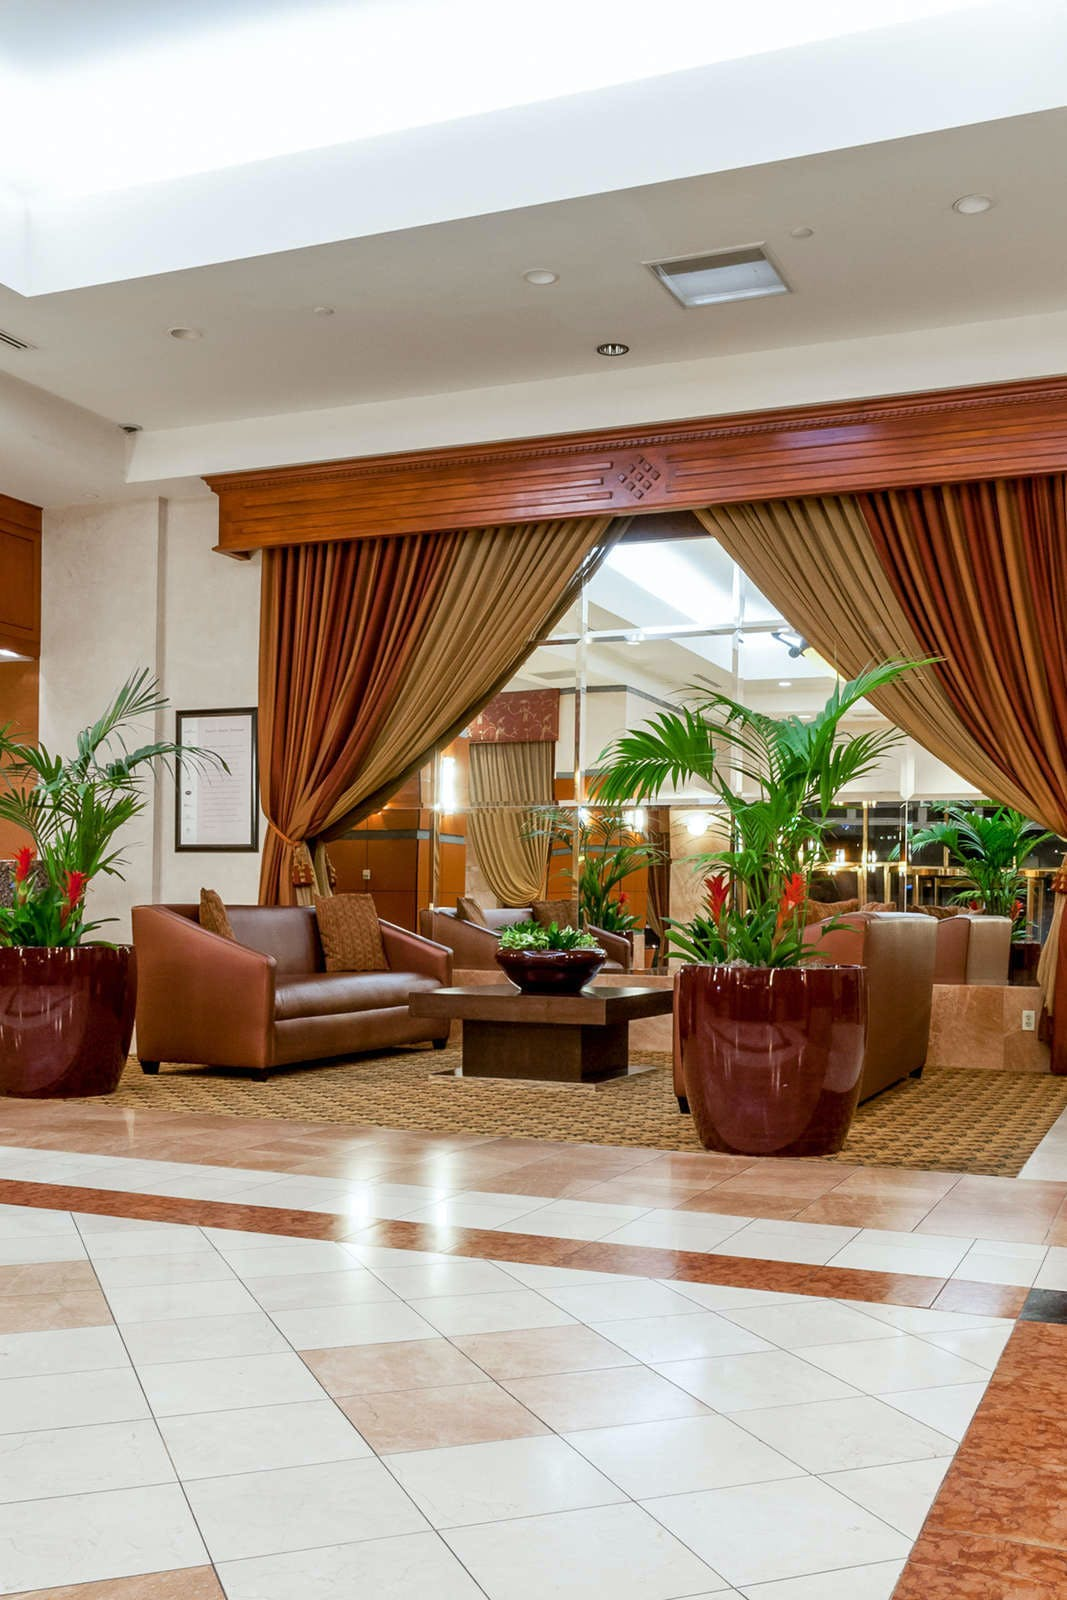 Hilton Los Angeles North/Glendale